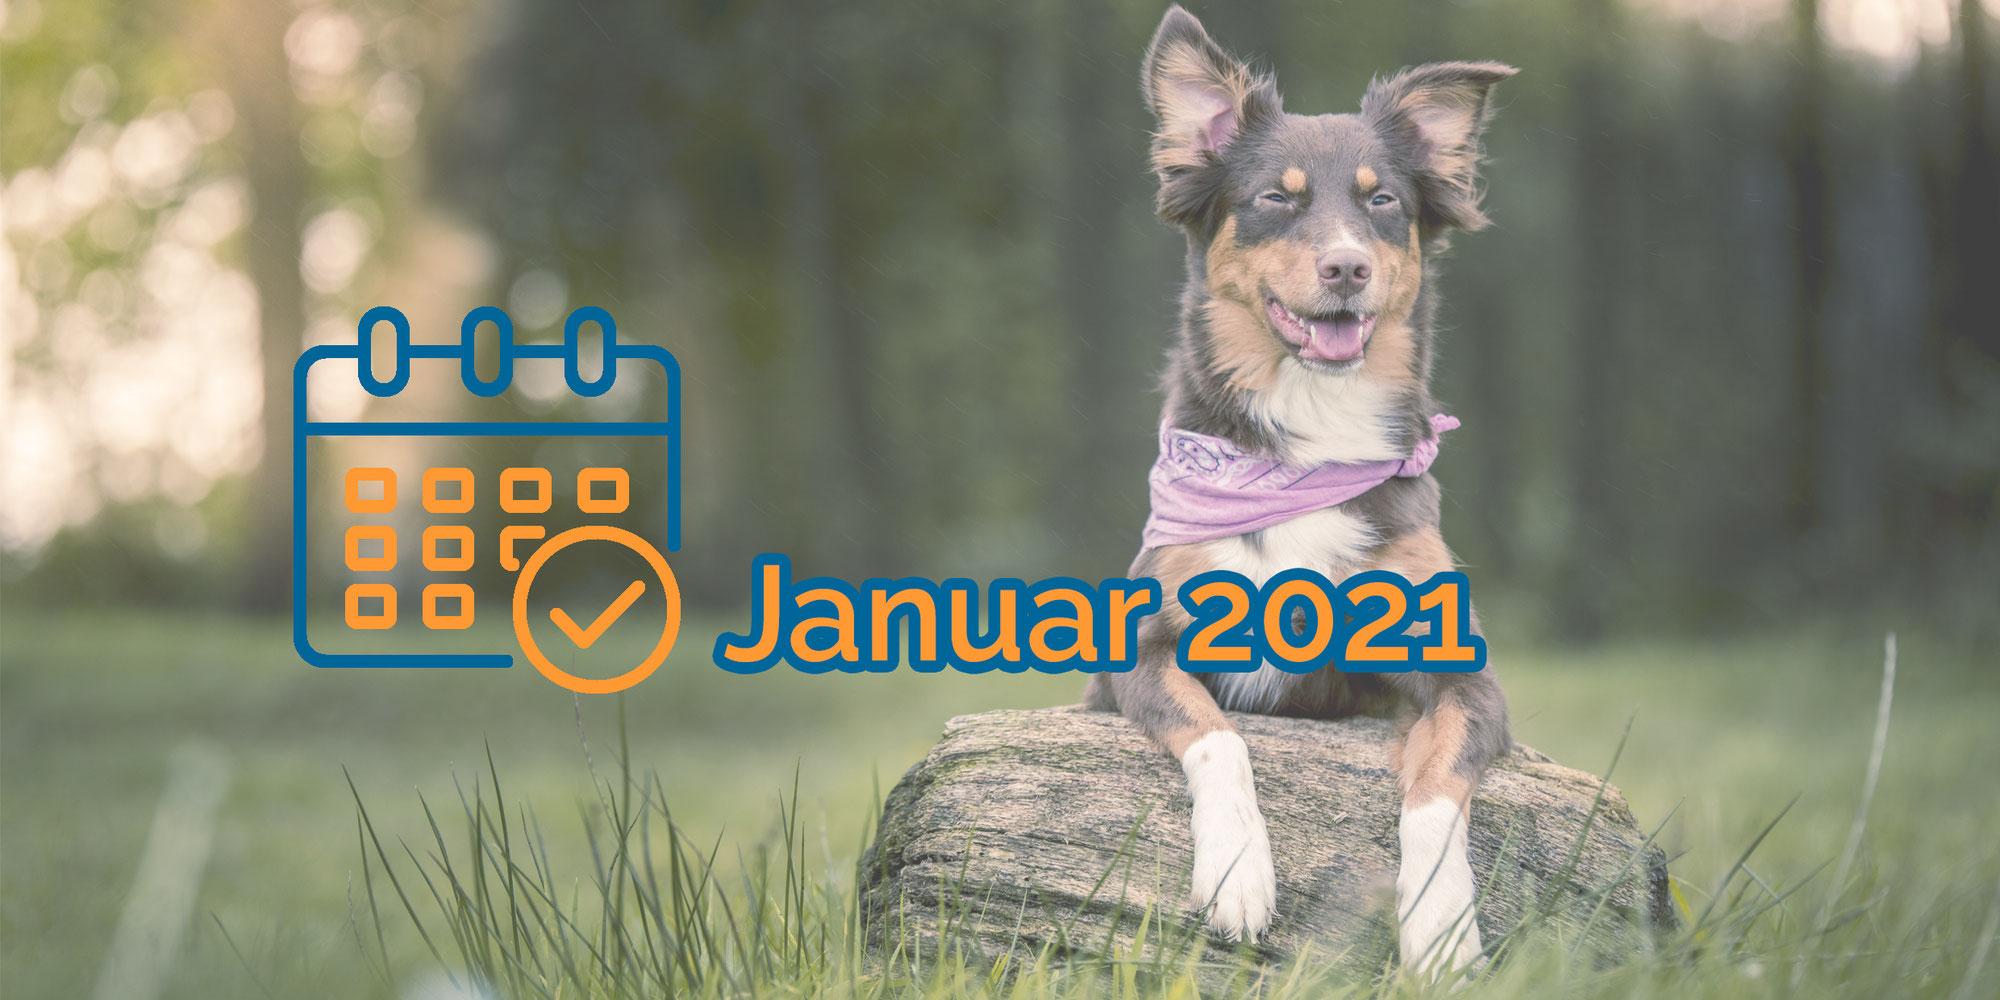 Nächste Termine kompakt (Januar 2021)